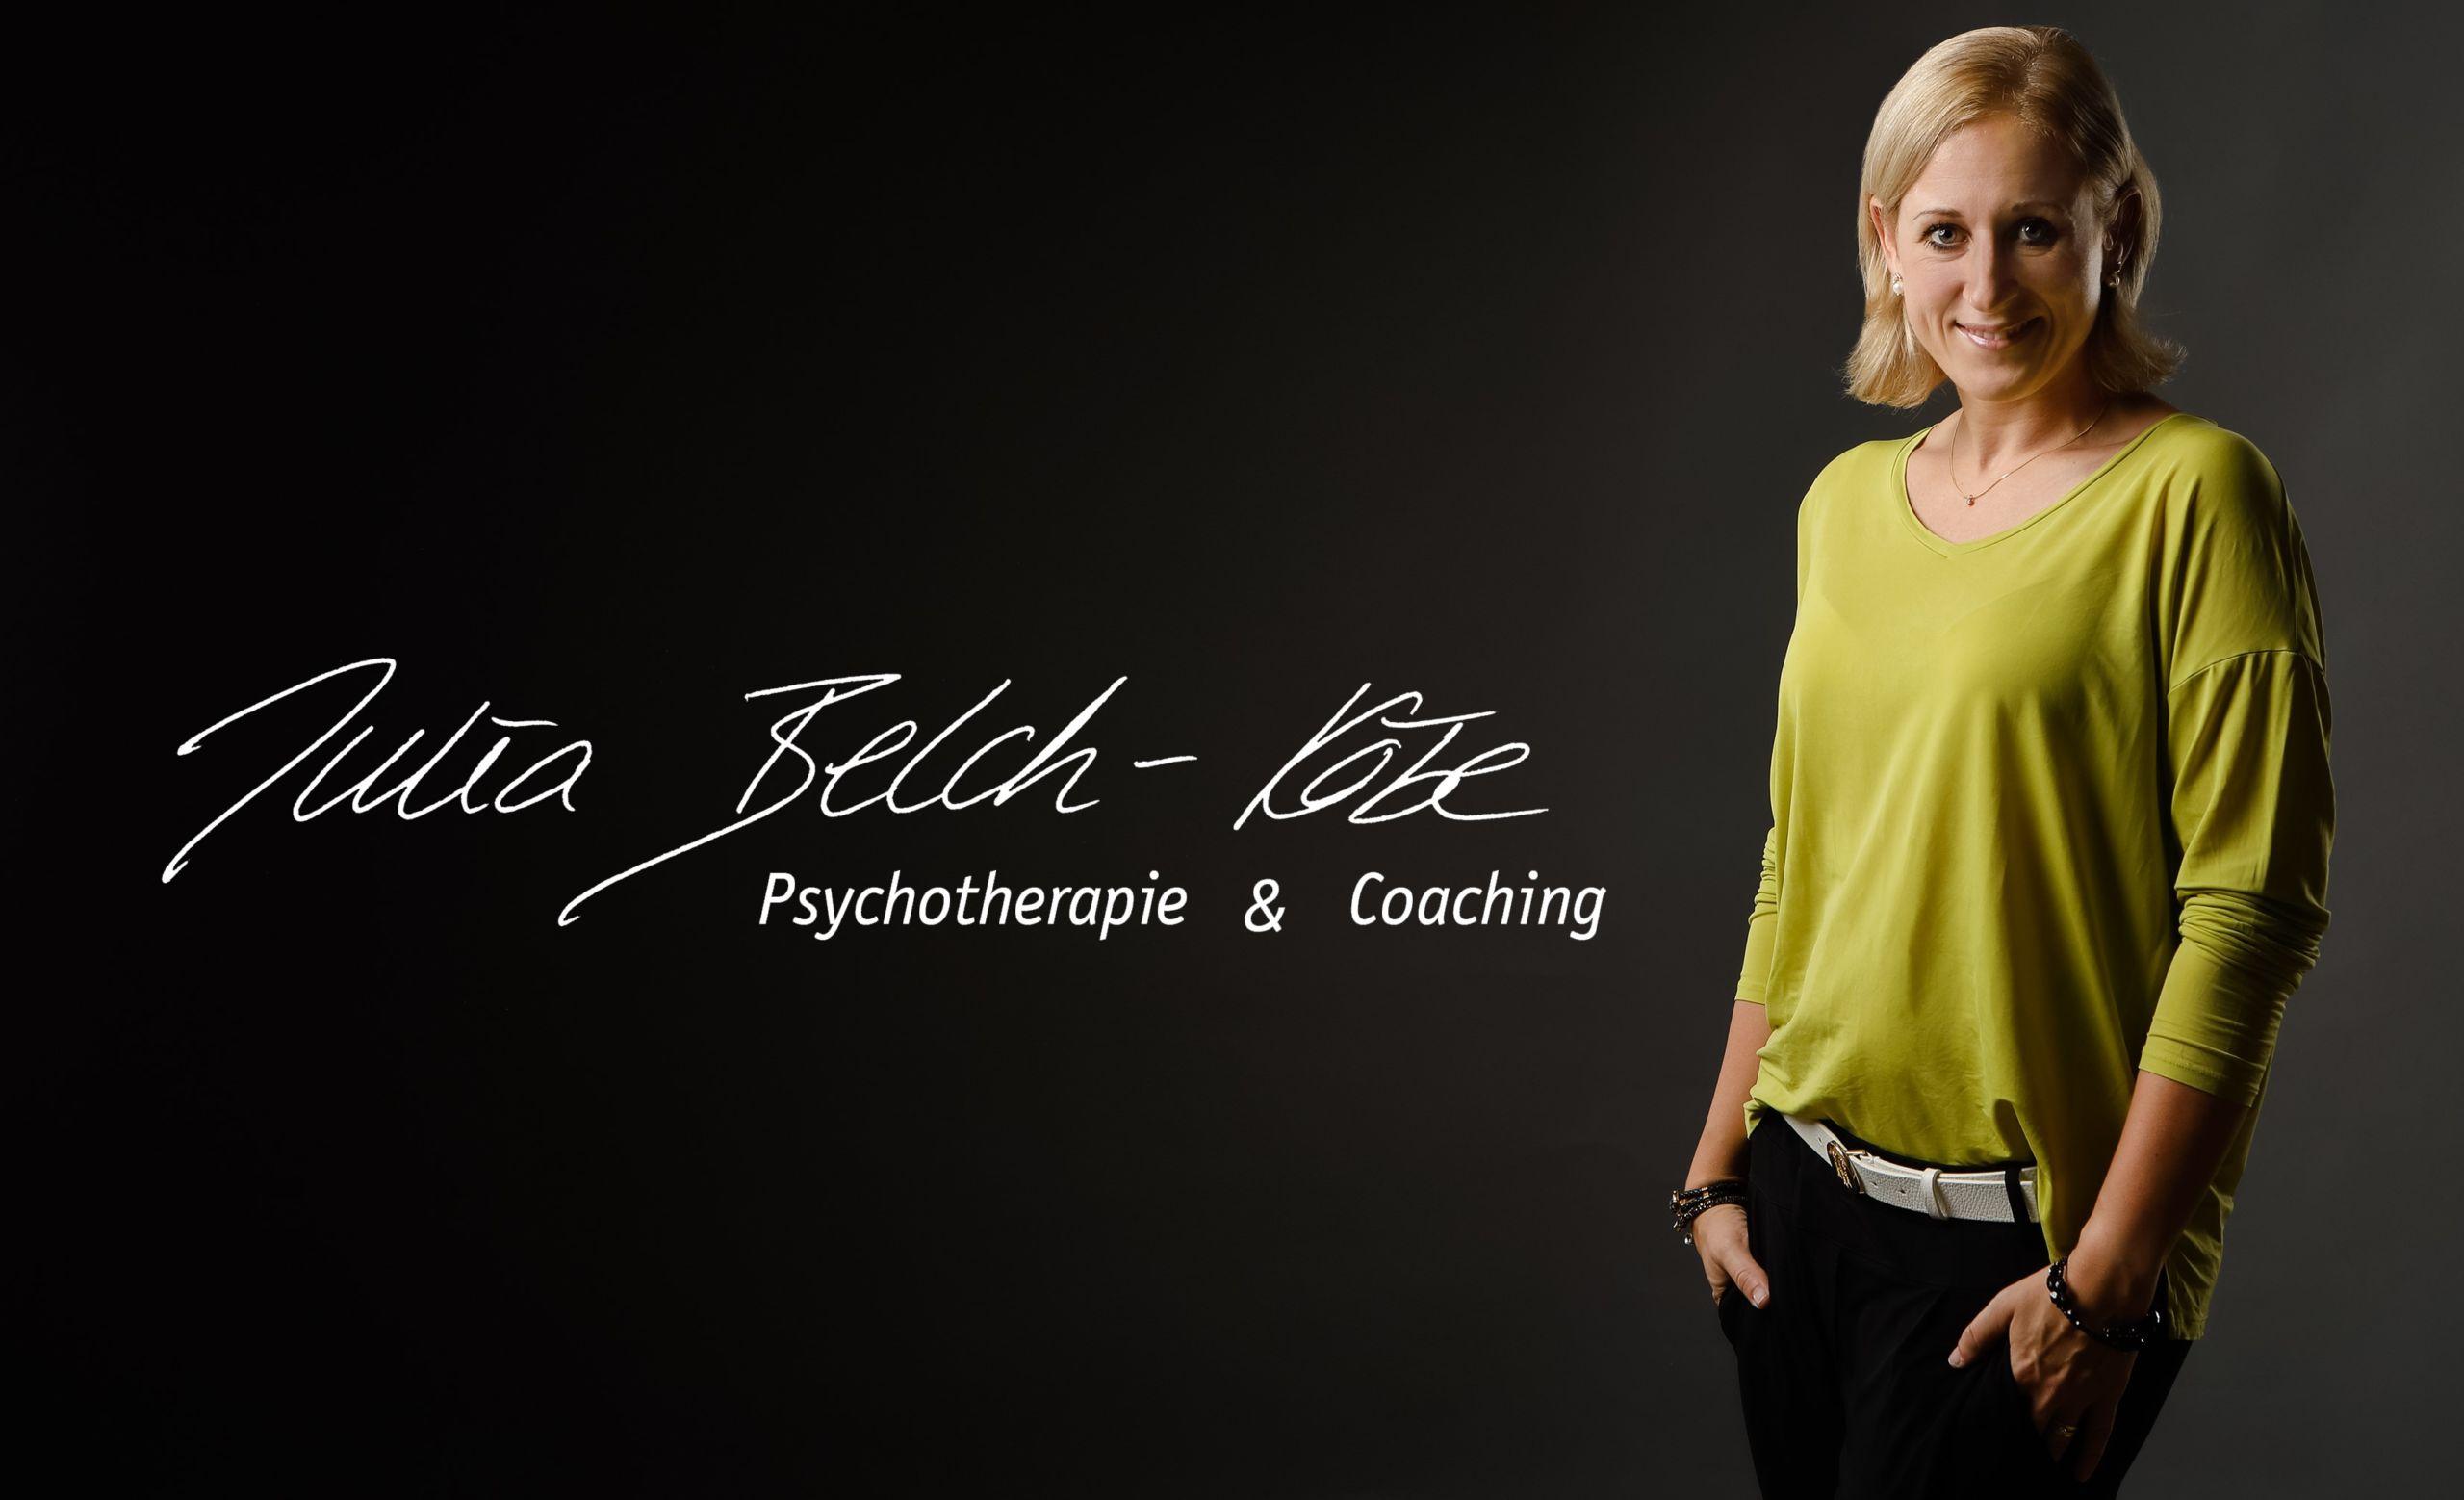 Psychotherapie & Coaching Julia Belch-Köbe